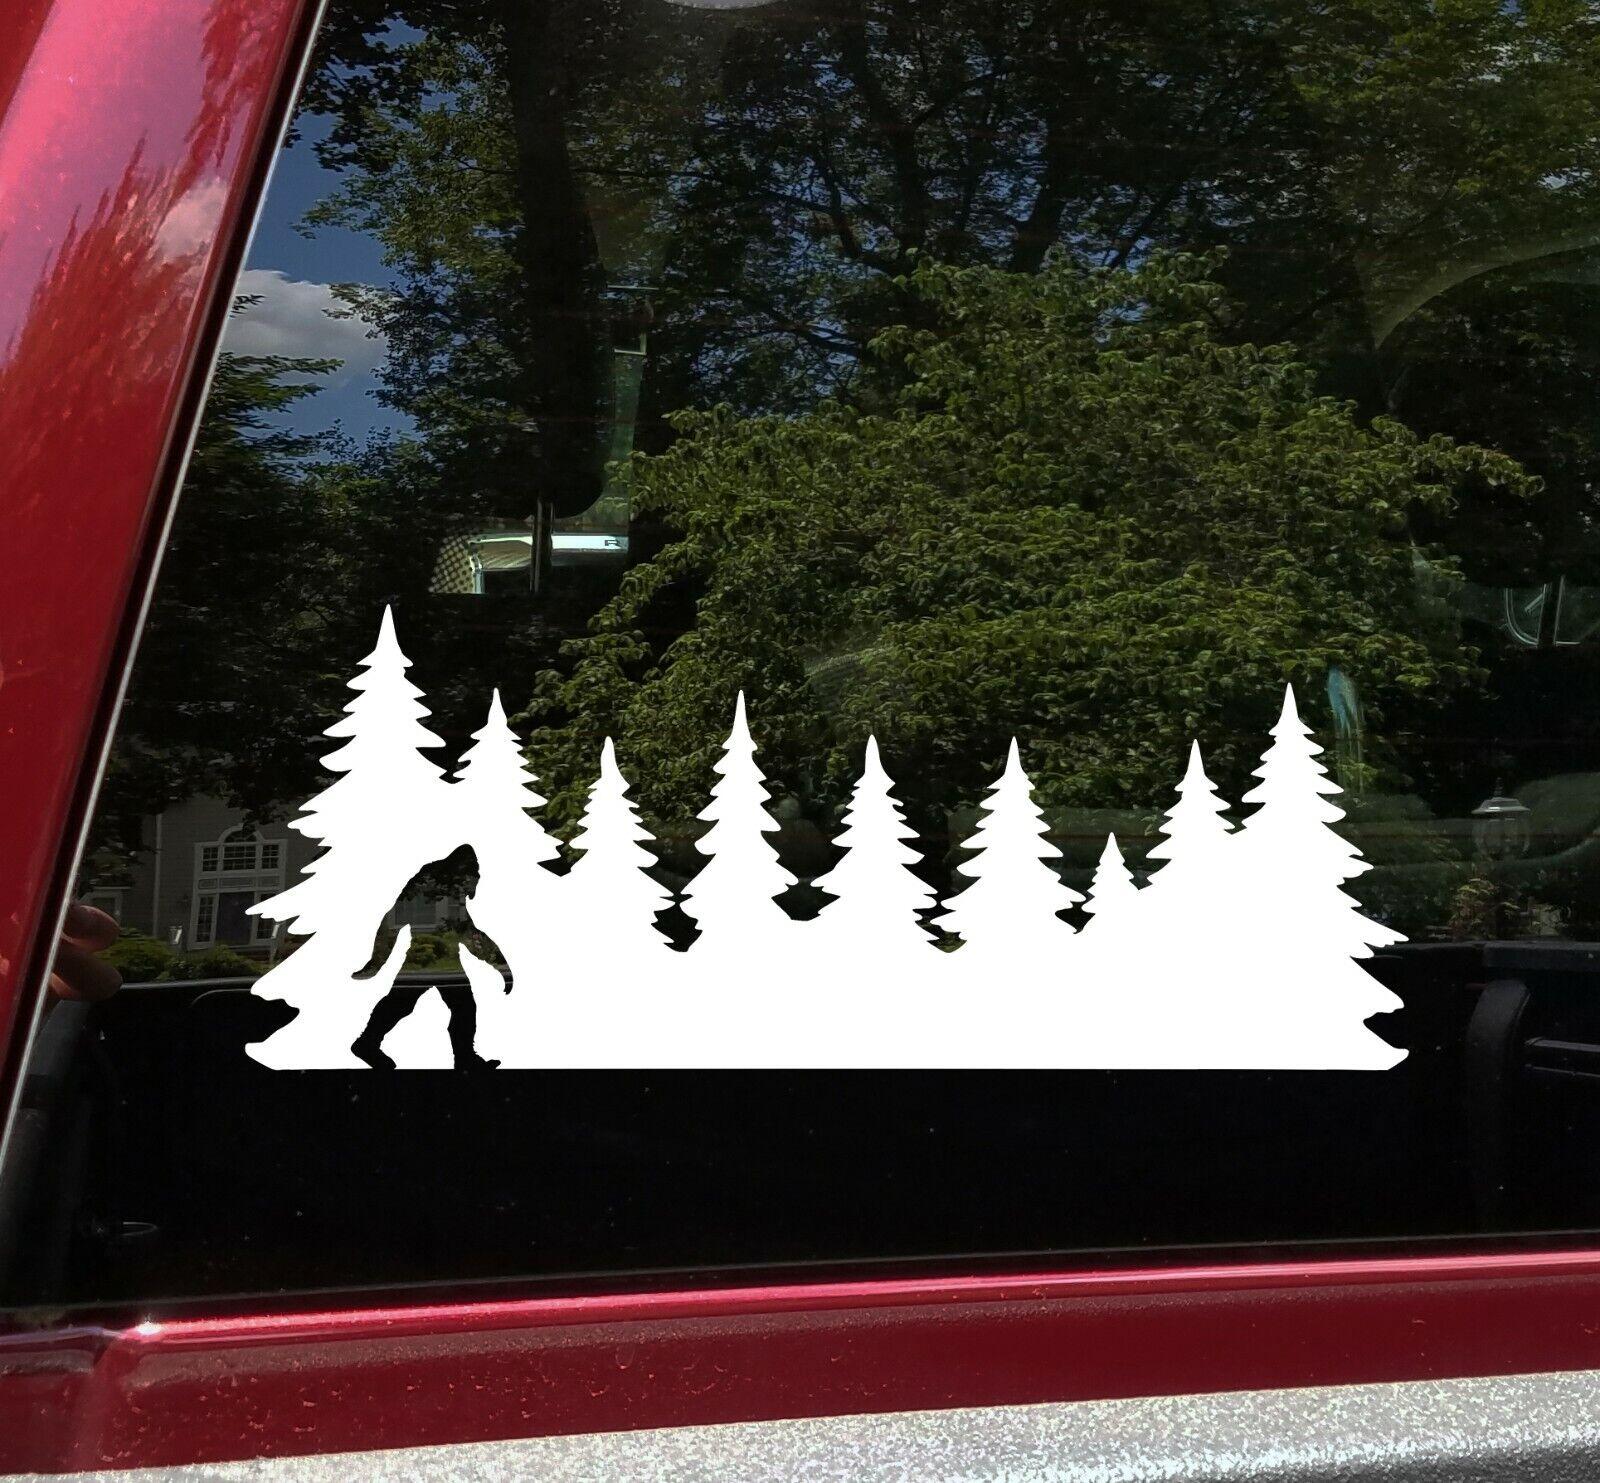 Home Decoration - Bigfoot in Treeline V2 Vinyl Decal Sticker - Pine Trees Forest PNW Sasquatch